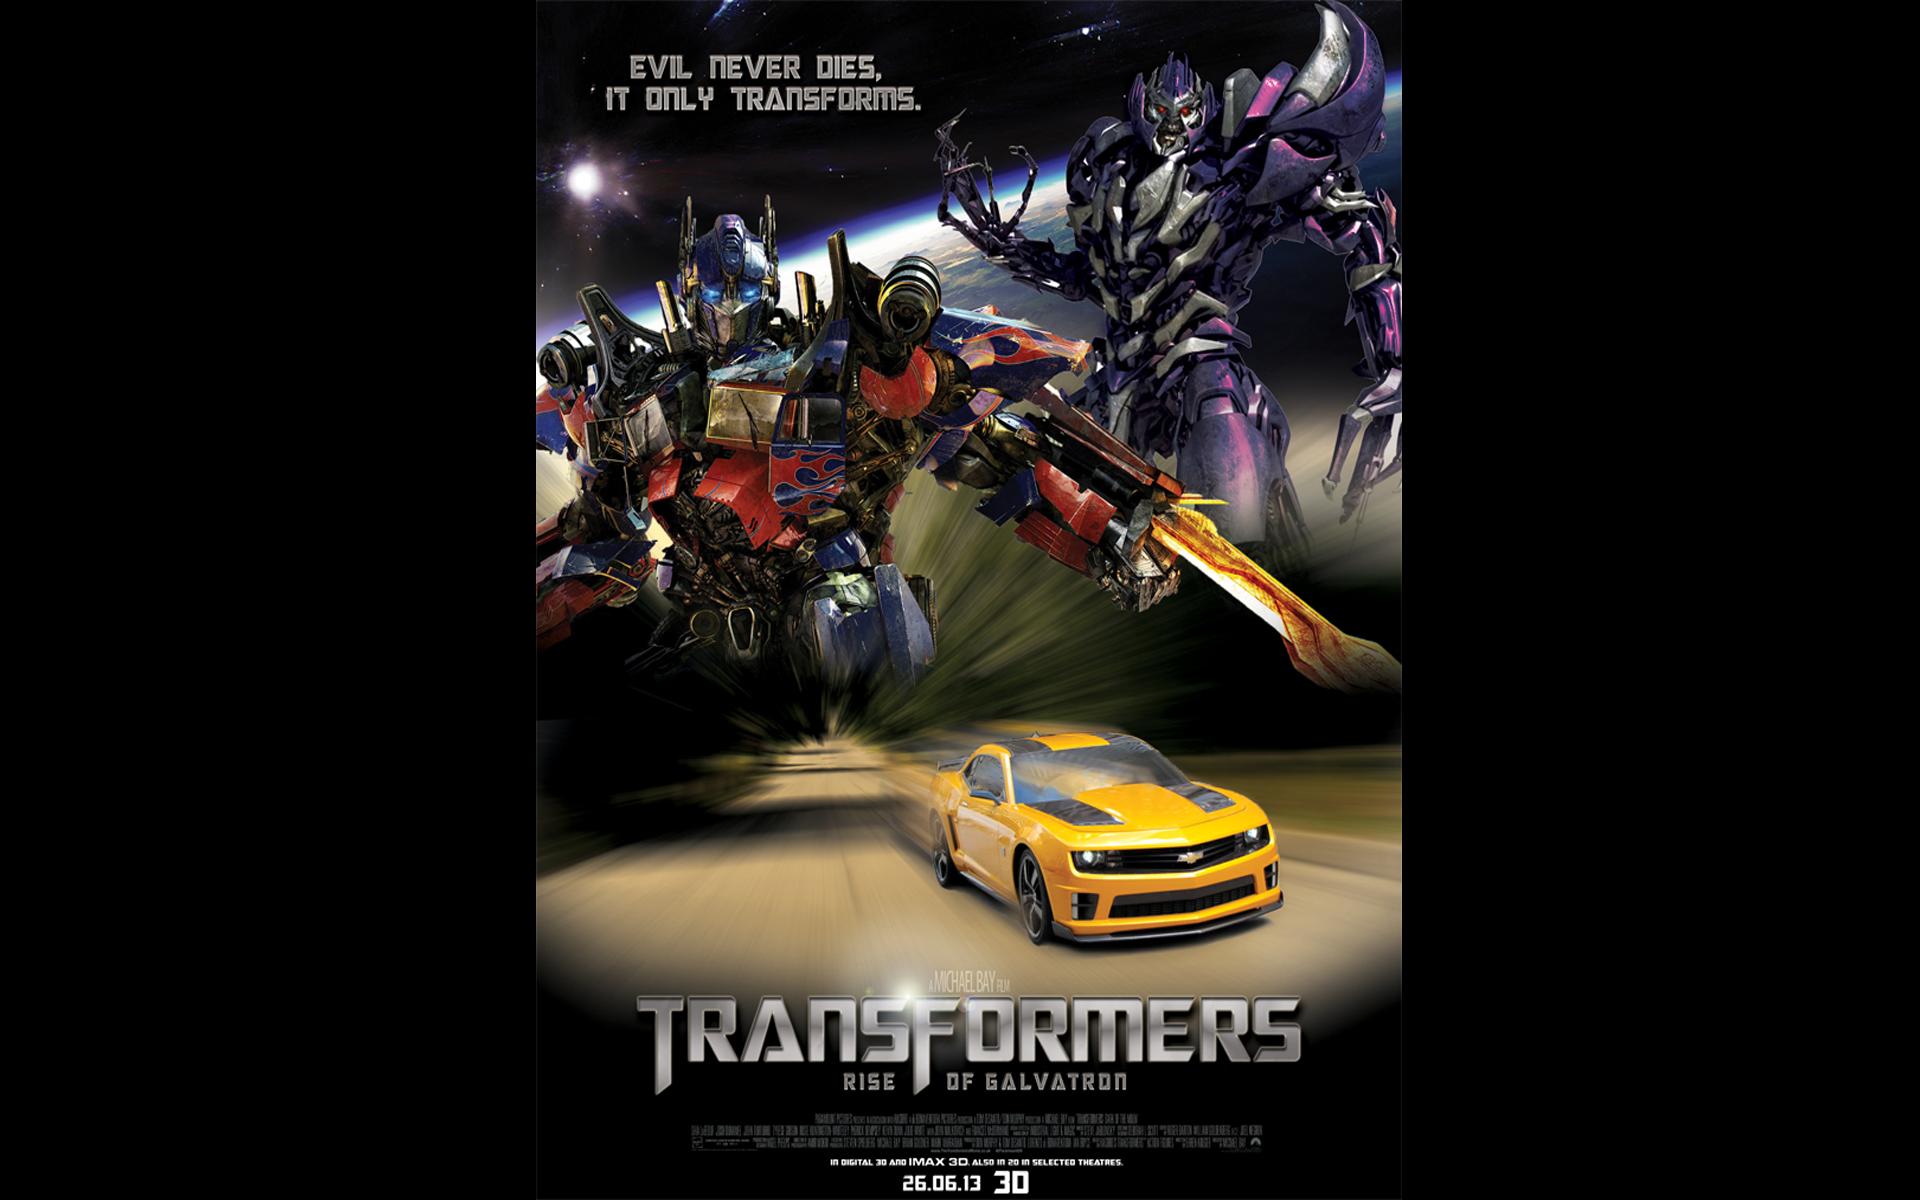 Transformers 4 Wallpaper   Transformers 4 Wallpaper 35116668 1920x1200